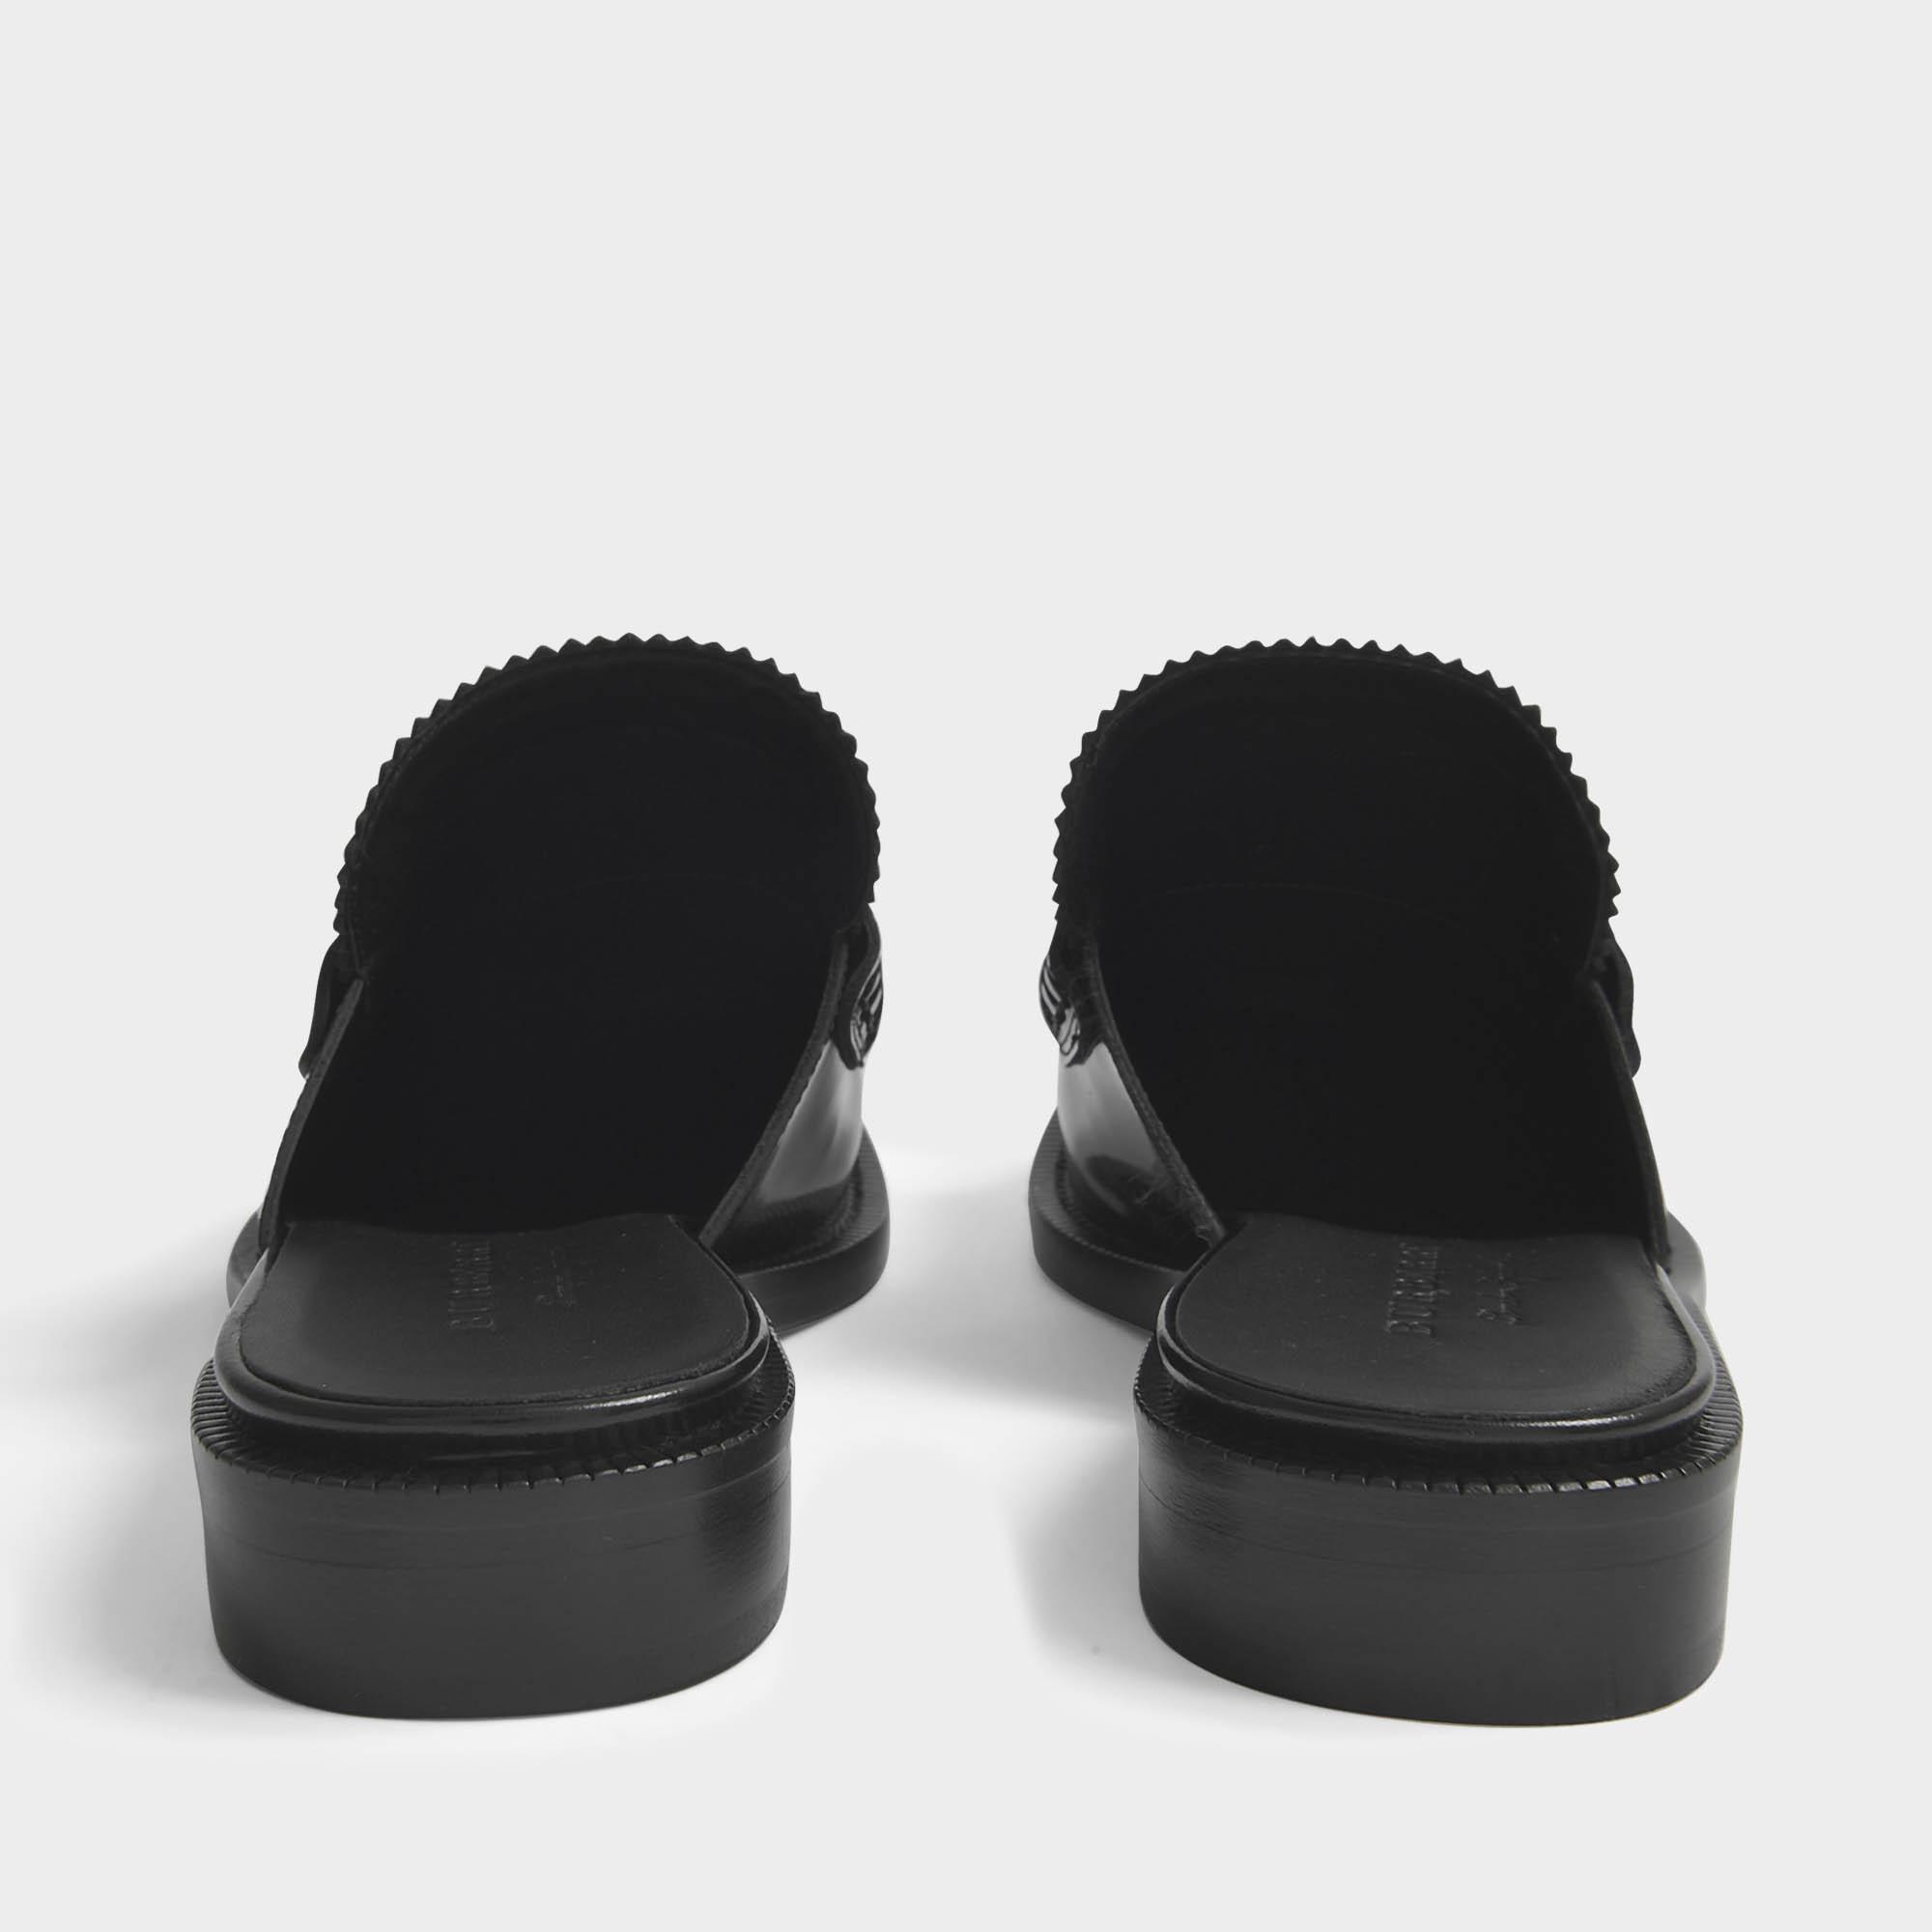 Burberry Chaussures Mule Frangé Beckshill En Cuir Noir kZwxIKP3sY